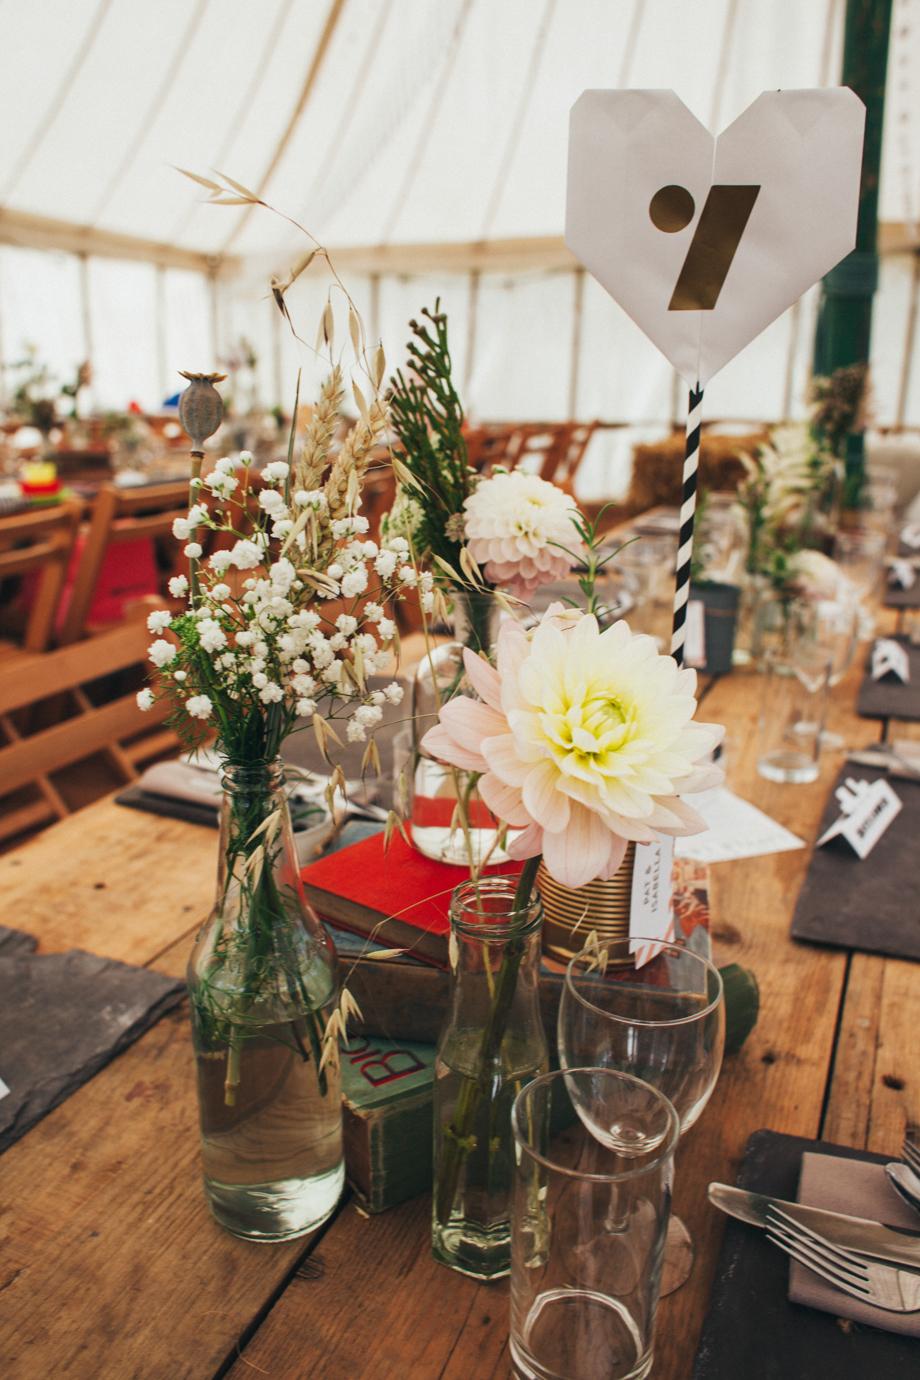 Shropshire-Festival-Wedding-1